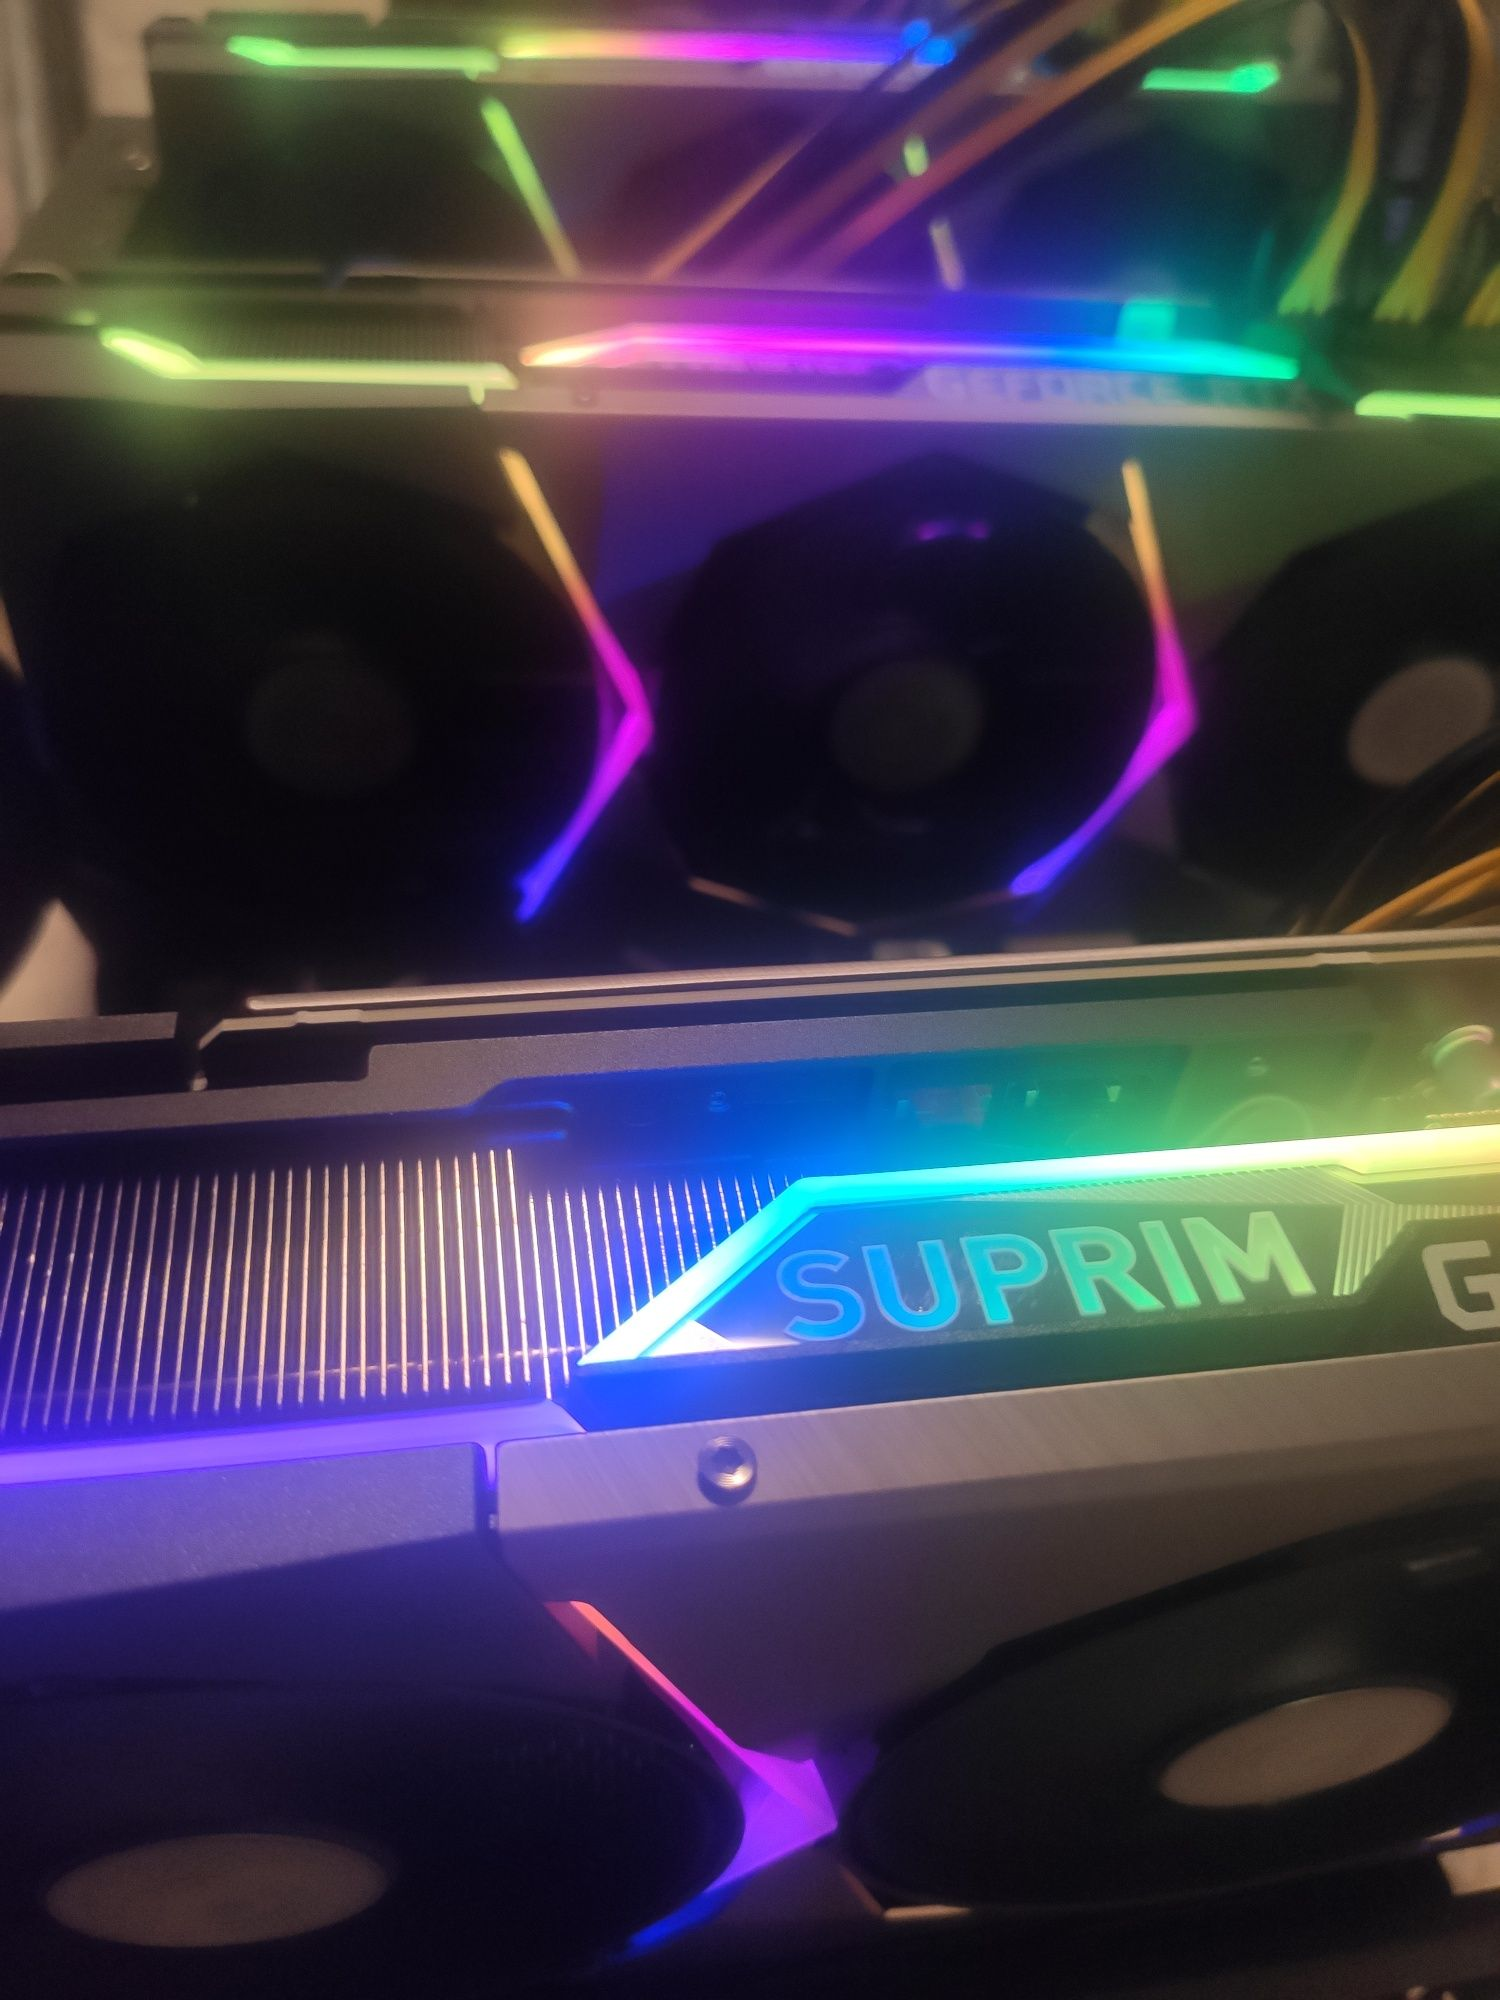 Mining Rig 3x RTX 3090 MSI Suprim X